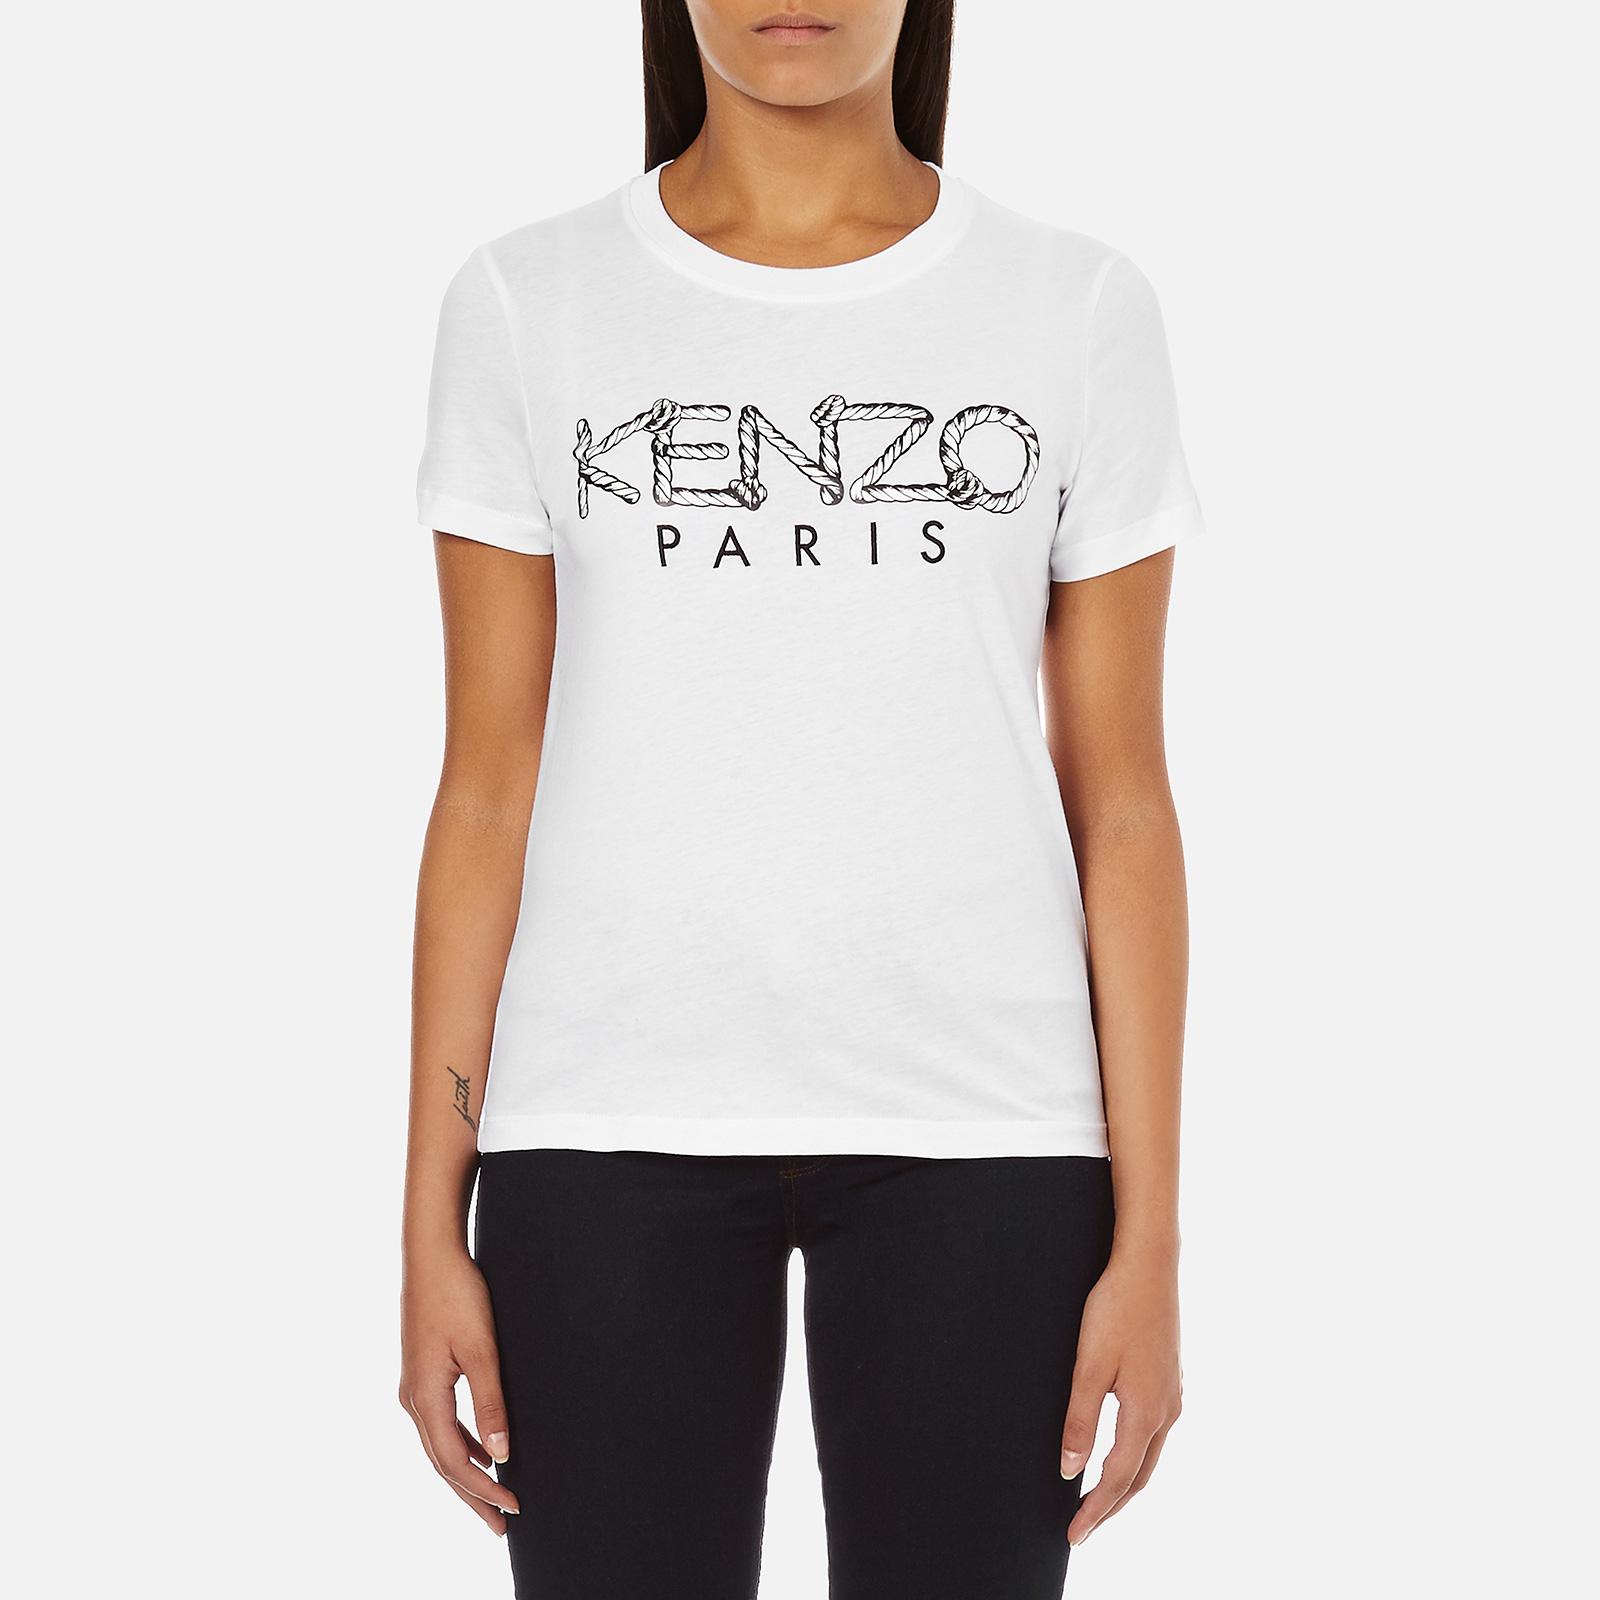 baca5877 KENZO Women's Paris Rope Logo T-Shirt - White